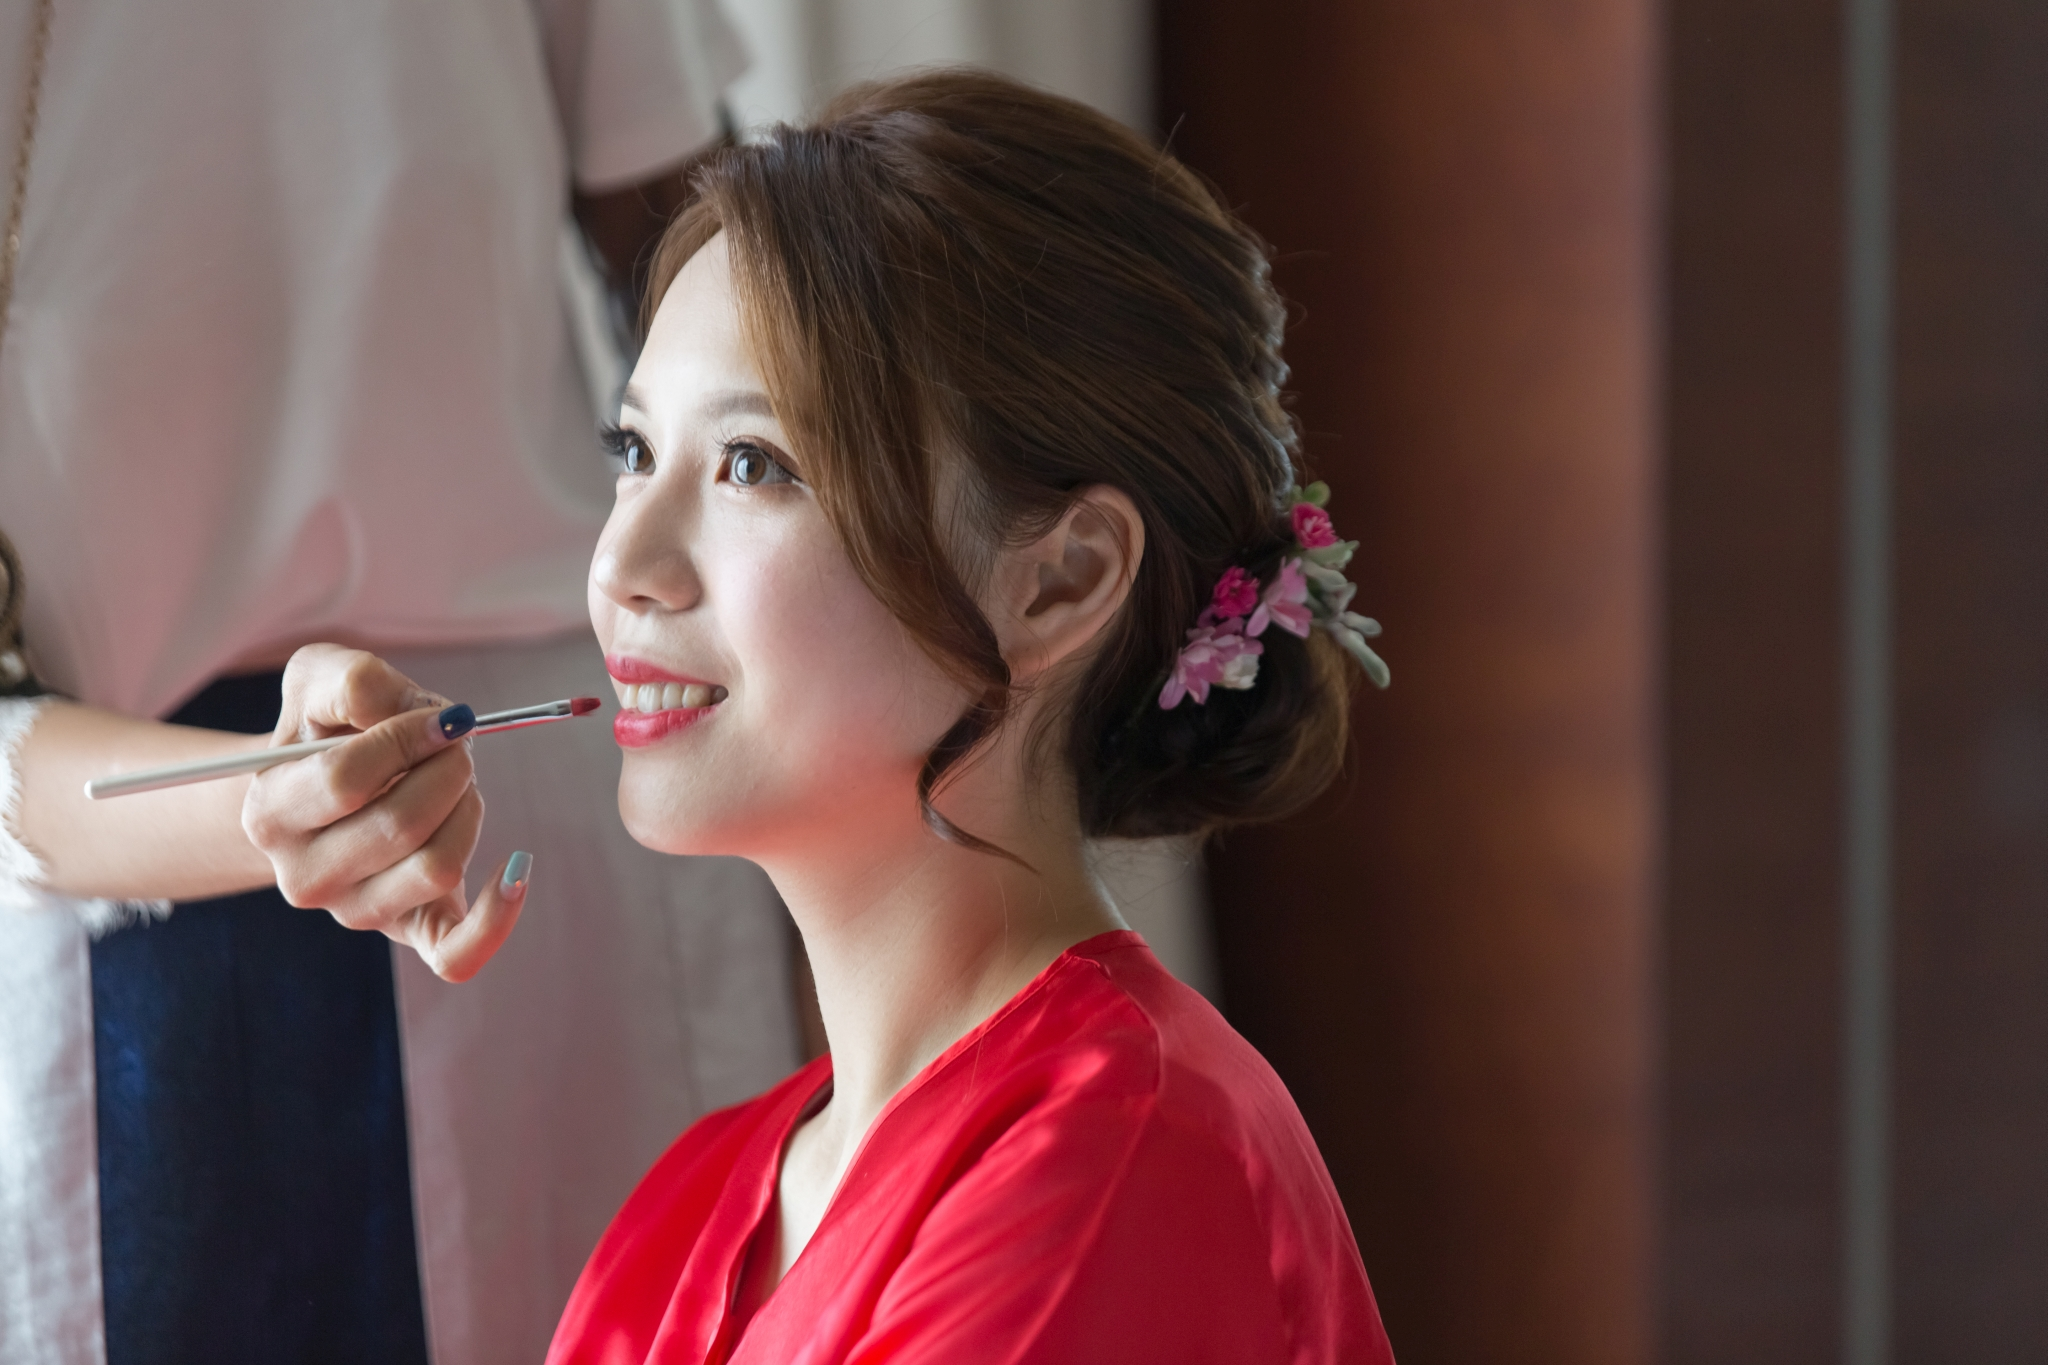 Preparation - 婚禮日準備及花絮作品